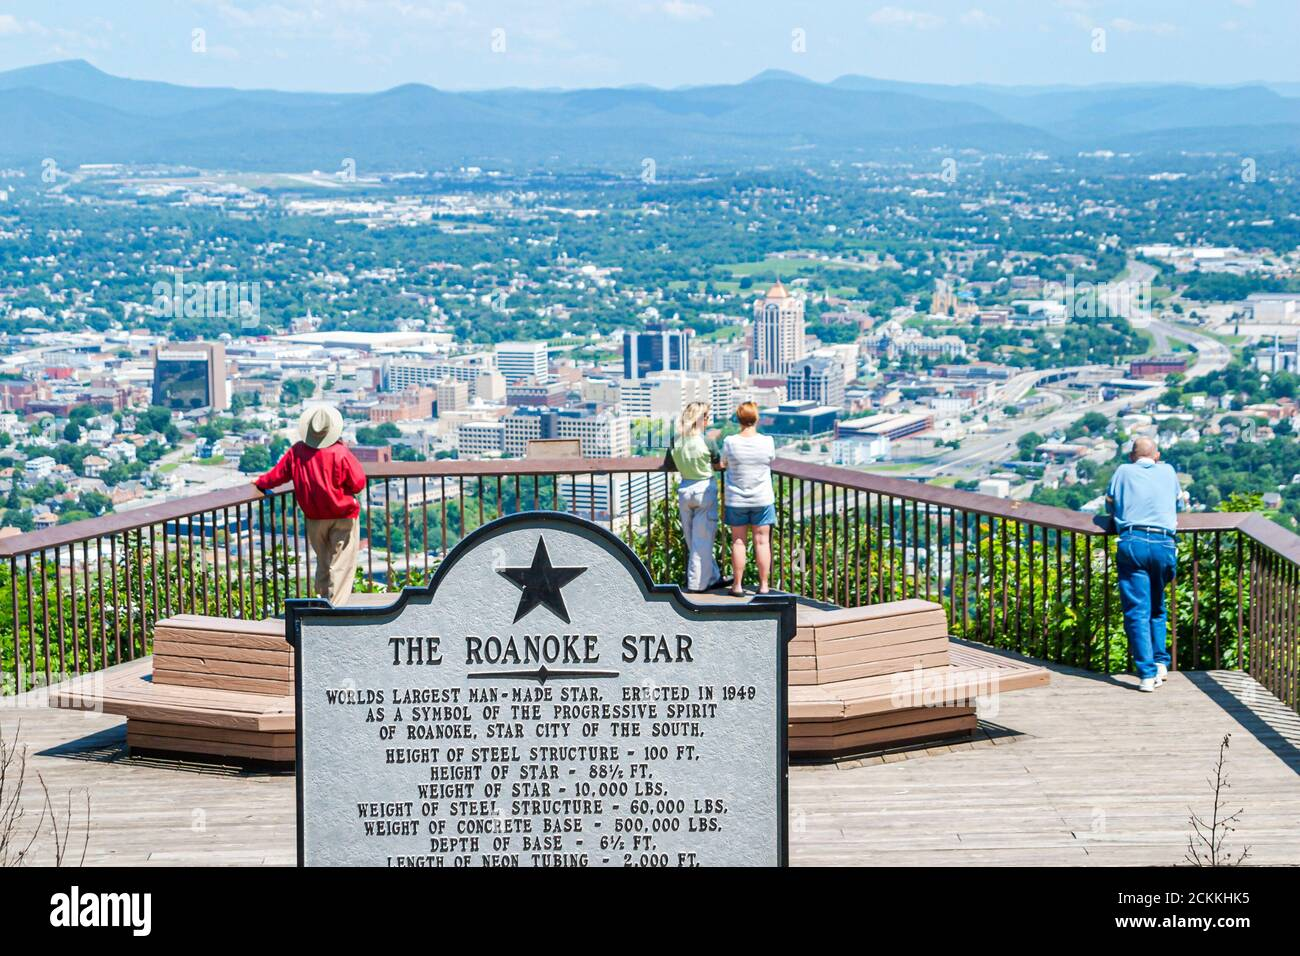 Virginia Appalachian Mountains Roanoke Mill Mountain Overlook, Star sign visiteurs, Banque D'Images